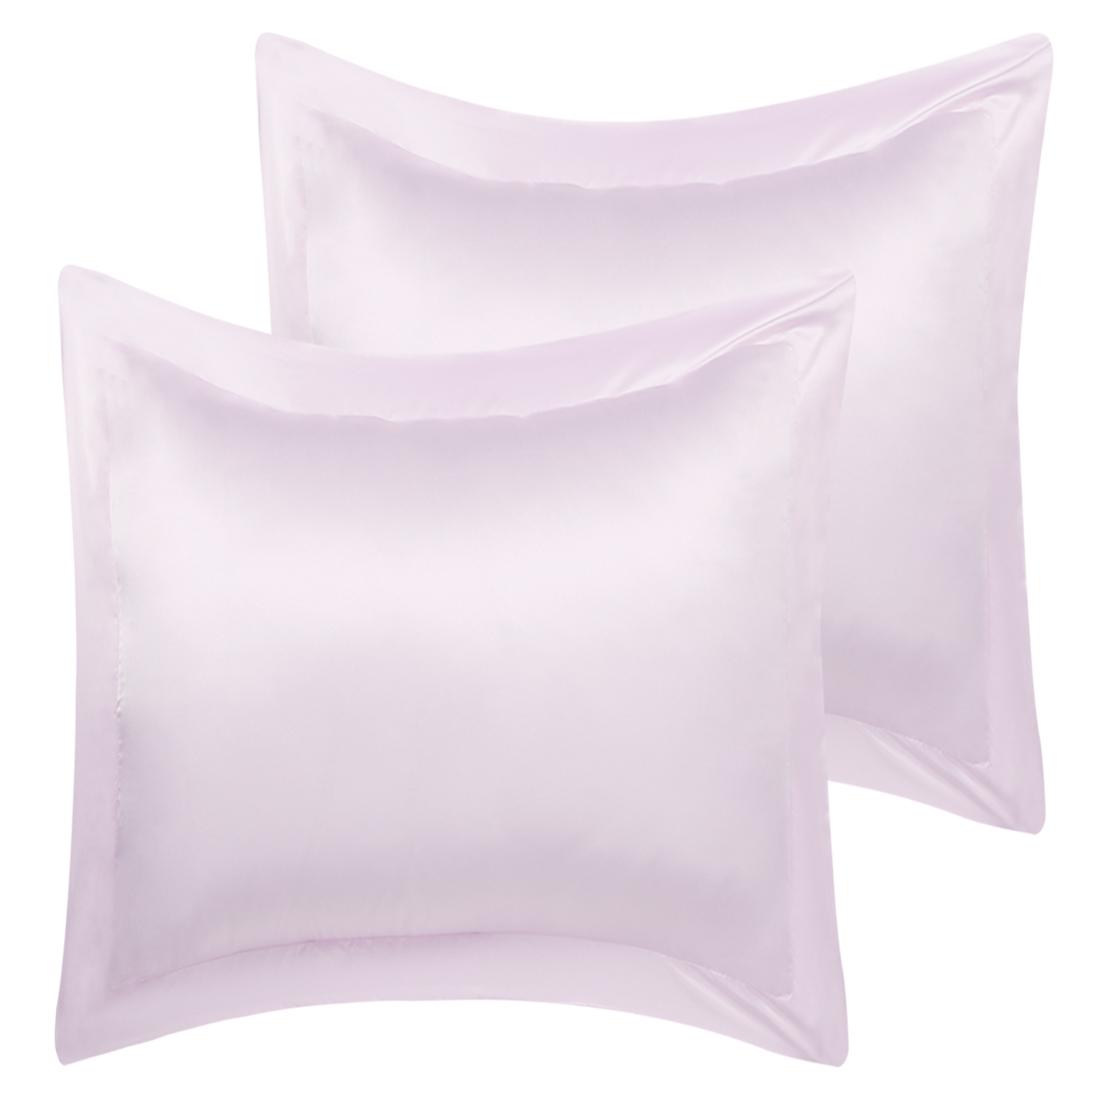 2 Pcs Lavender Gray Pillow Shams Satin Pillow Cases European Oxford Pillowcases